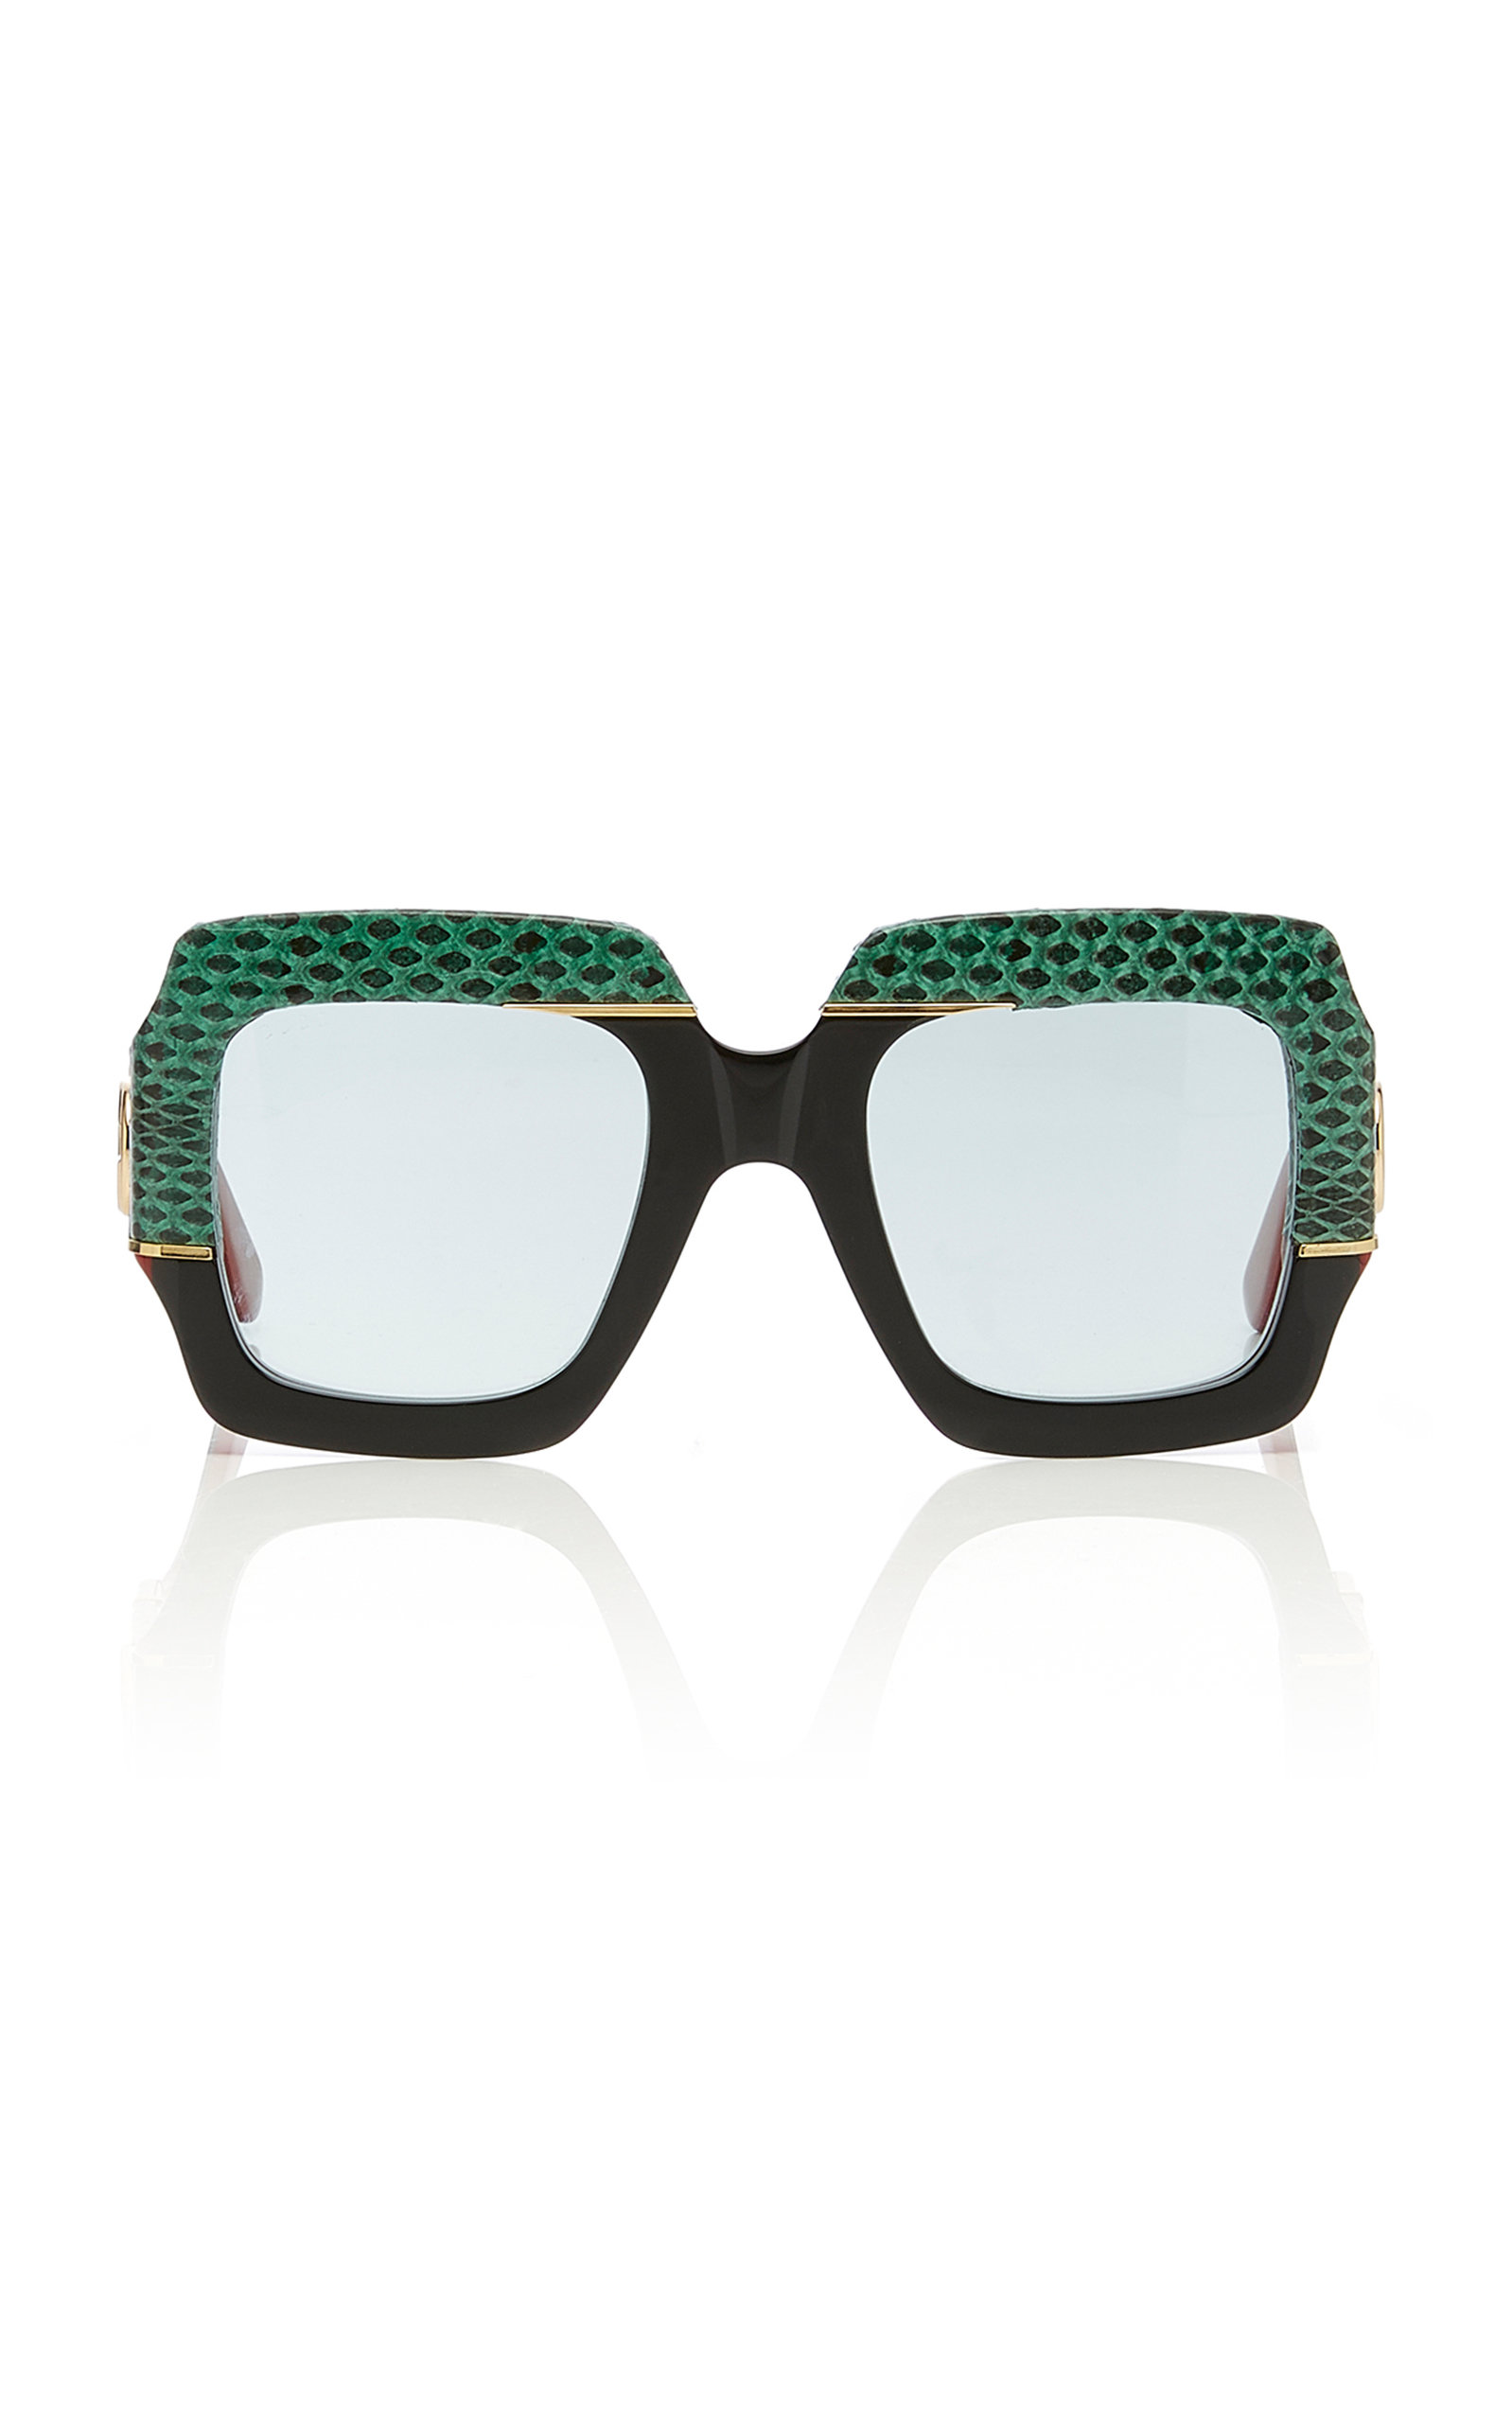 06de859f1951 Gucci SunglassesSquare-Frame Snakeskin and Acetate Sunglasses. CLOSE.  Loading